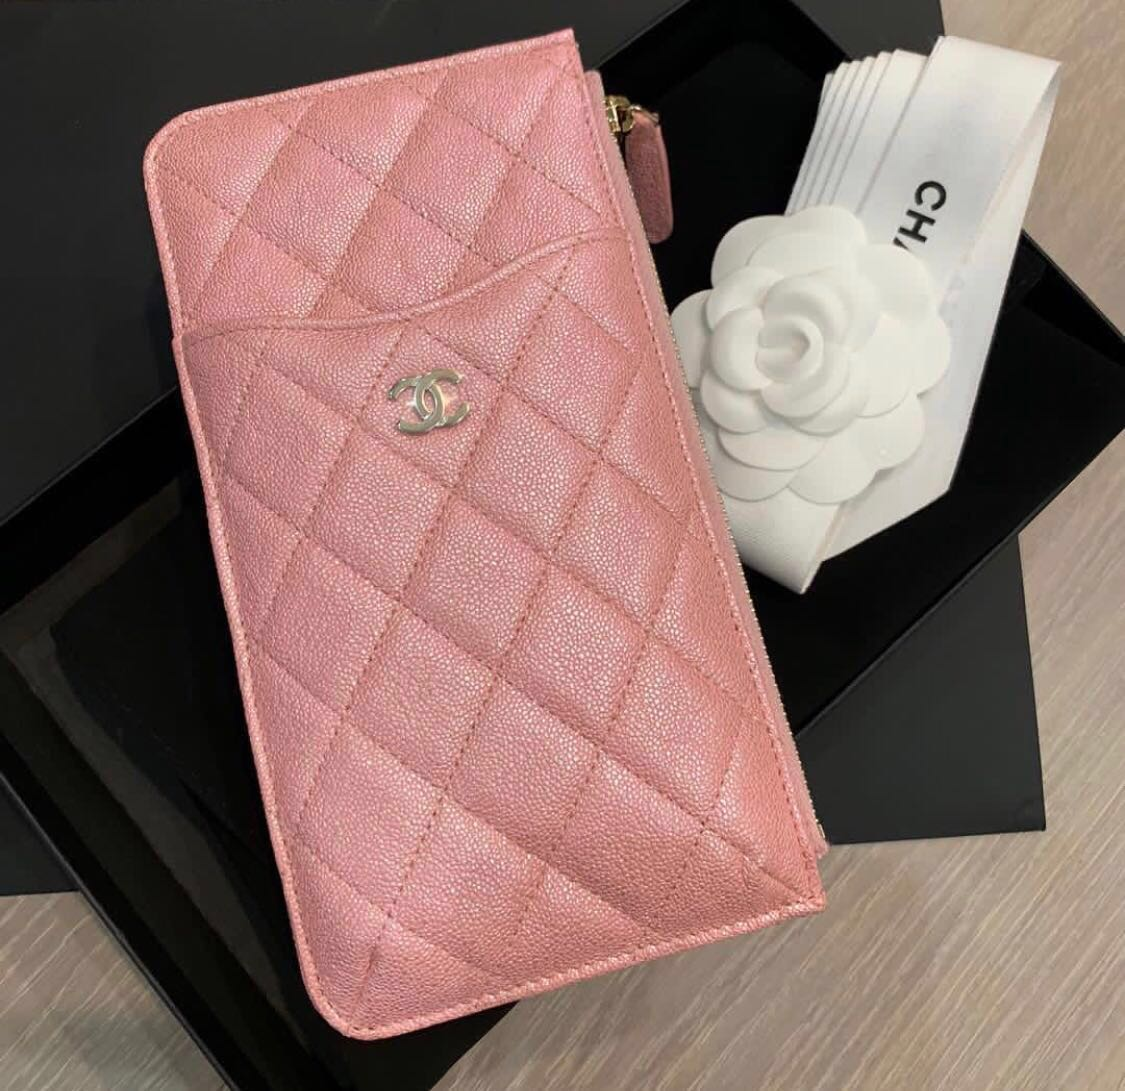 549ae68b17e56e 🔥🦄NEW! CHANEL 19S Pink Iridescent Caviar Phone & Card Wallet ...